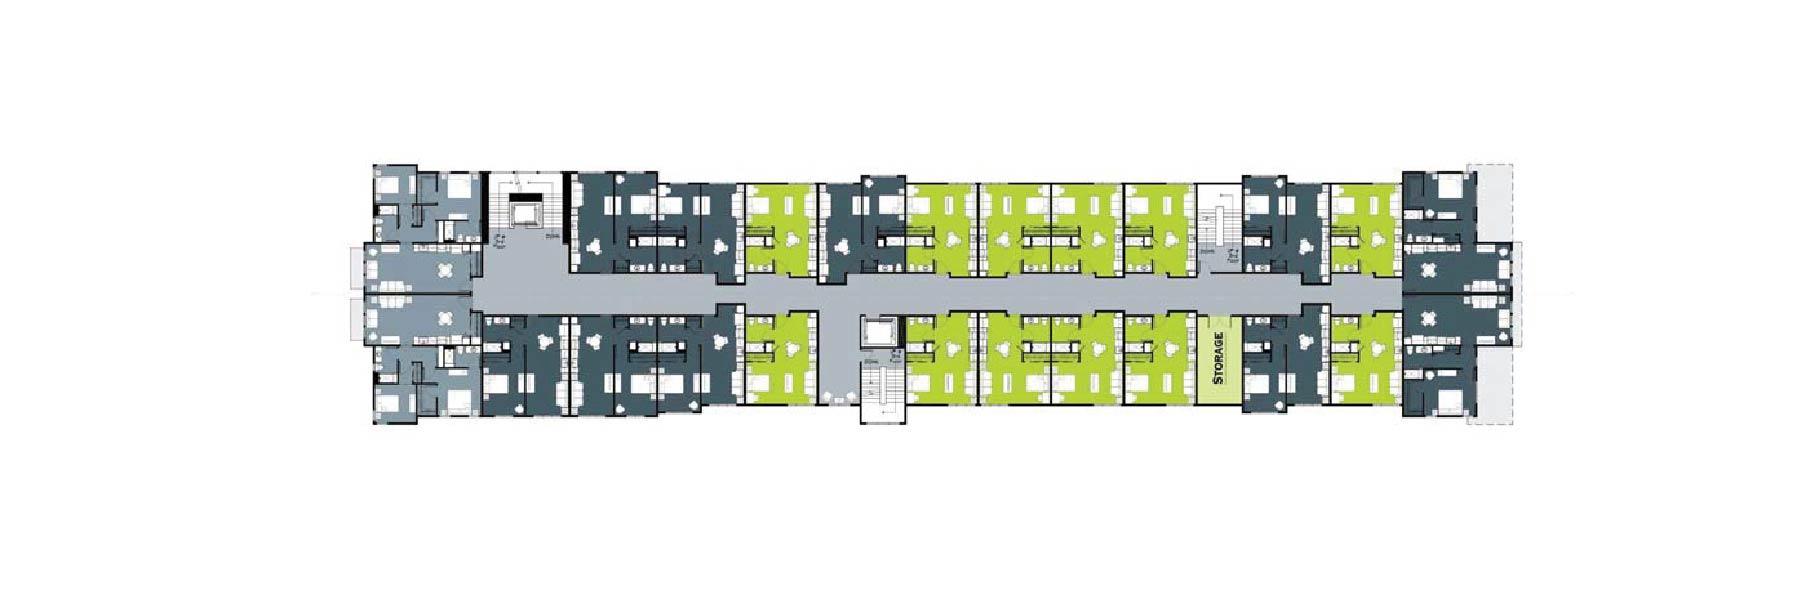 Trailhead Level 3 and 4 Floor Plans